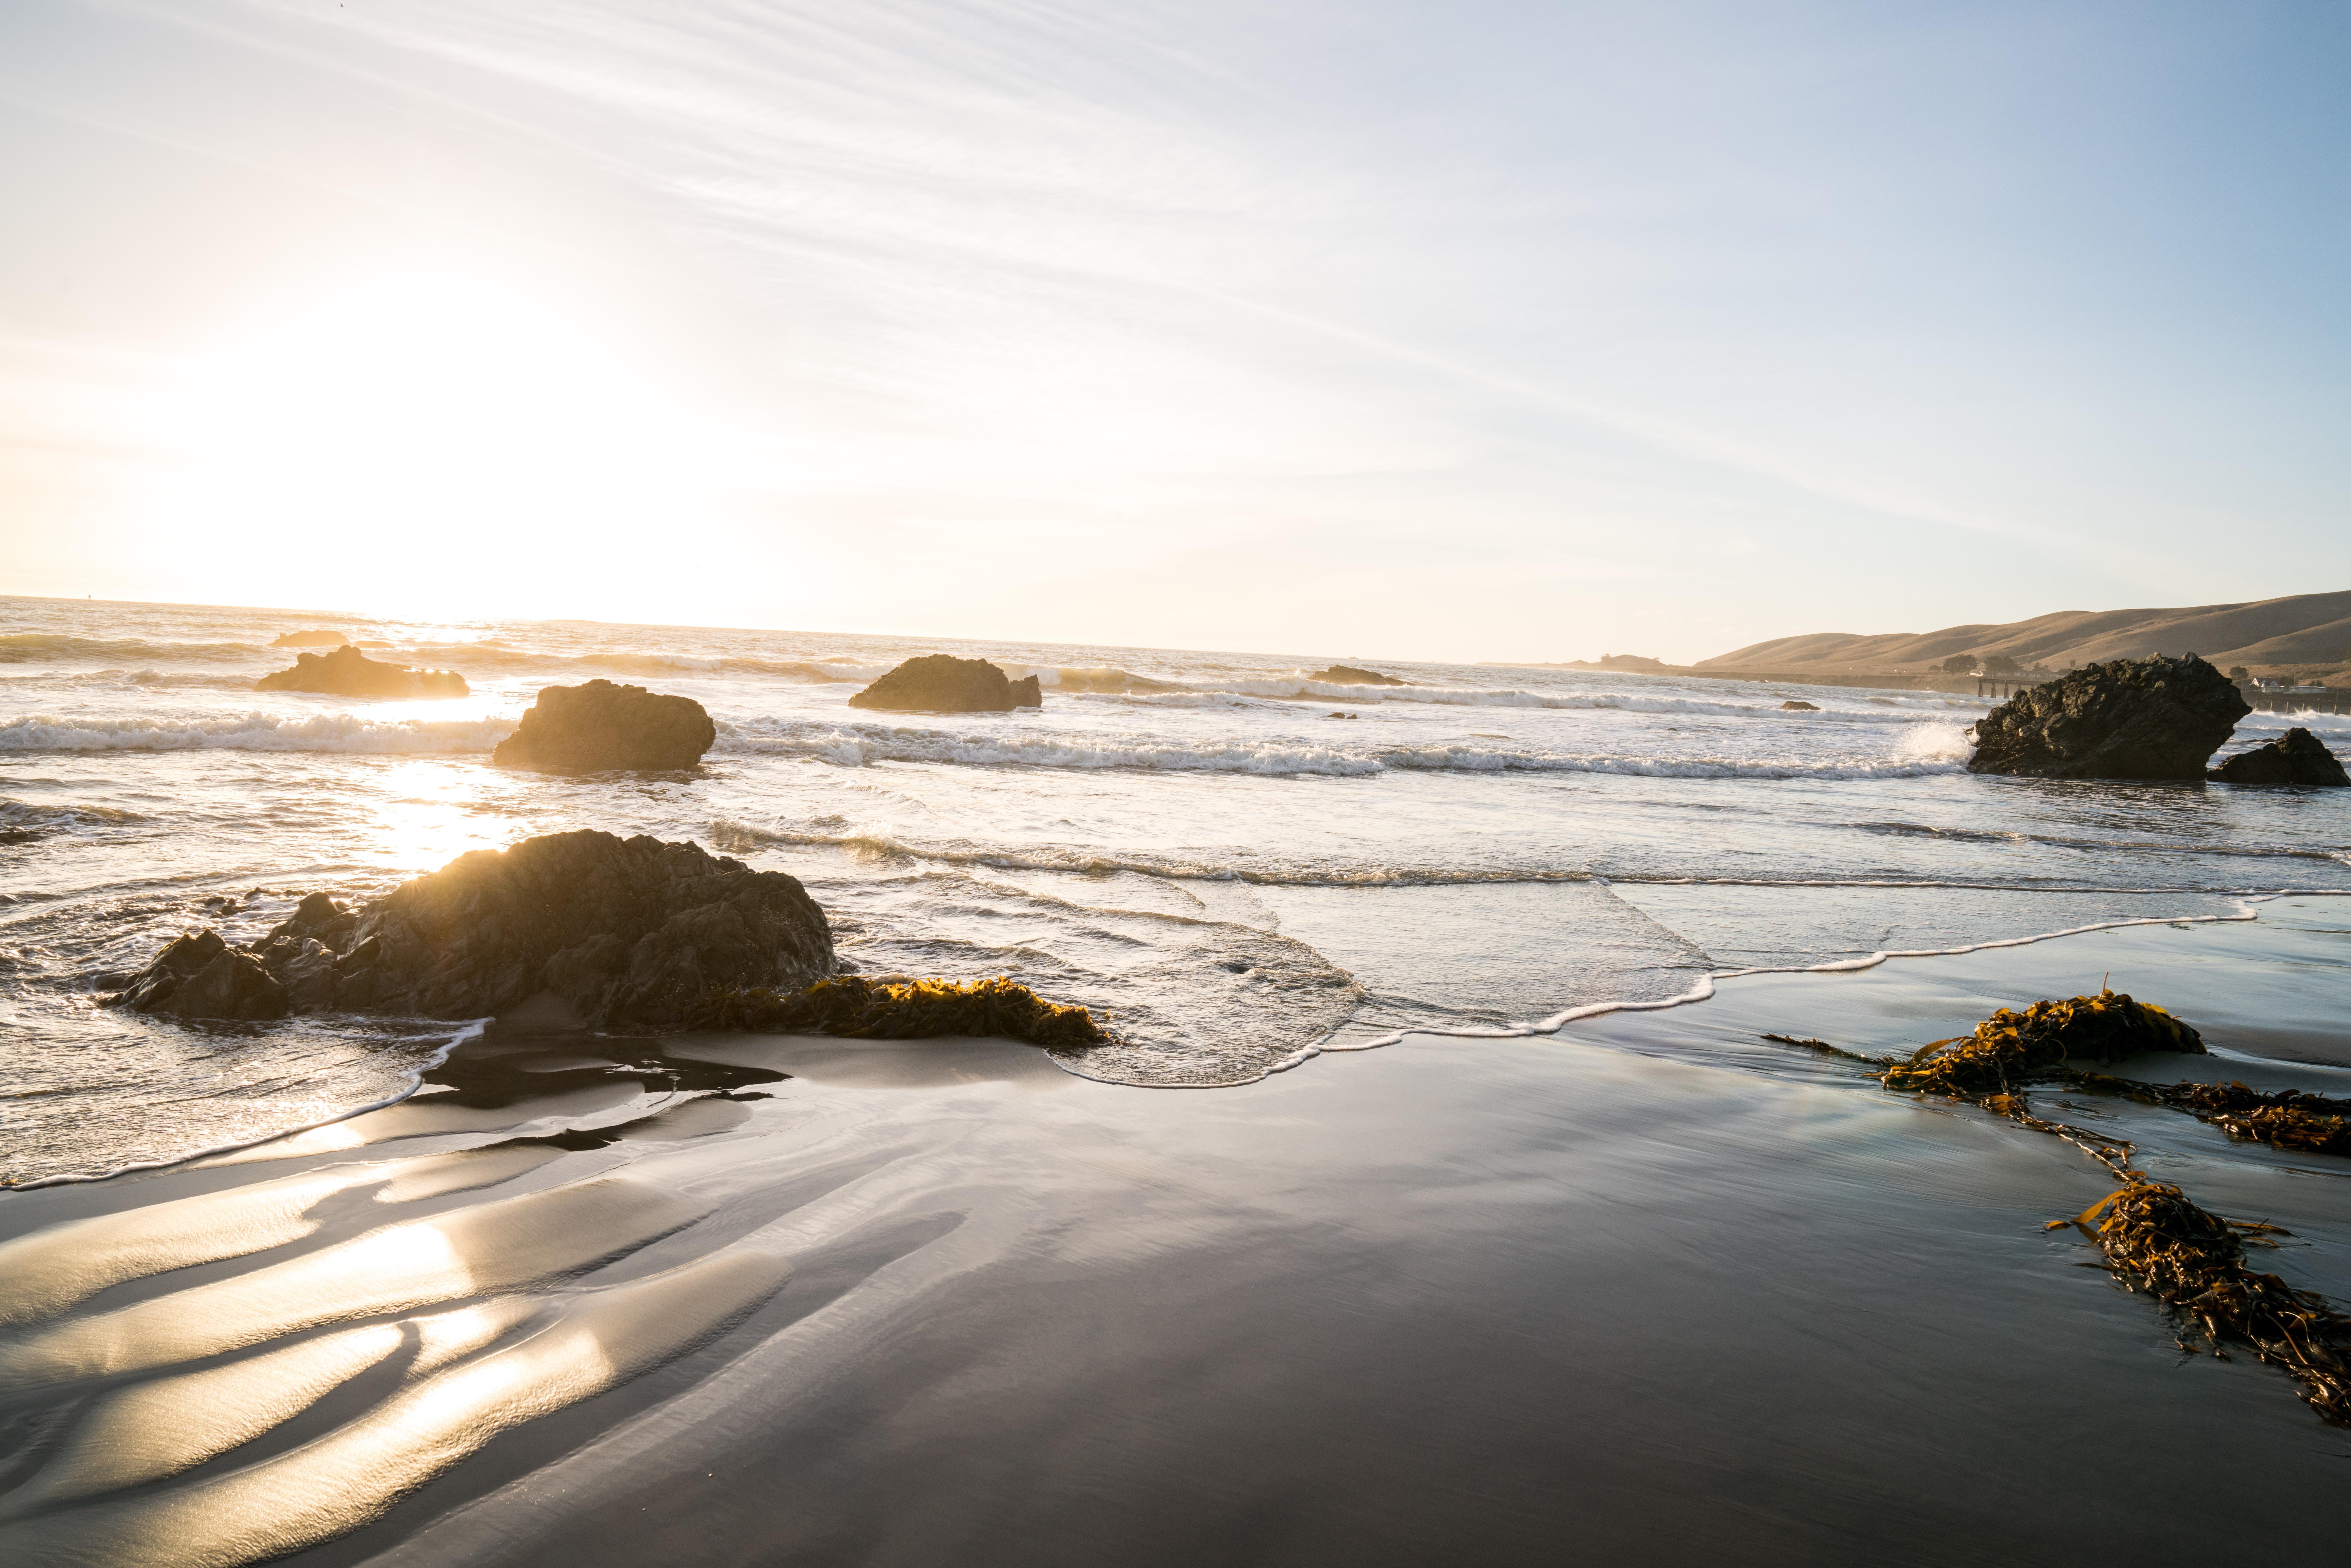 rocks on shore during daytime